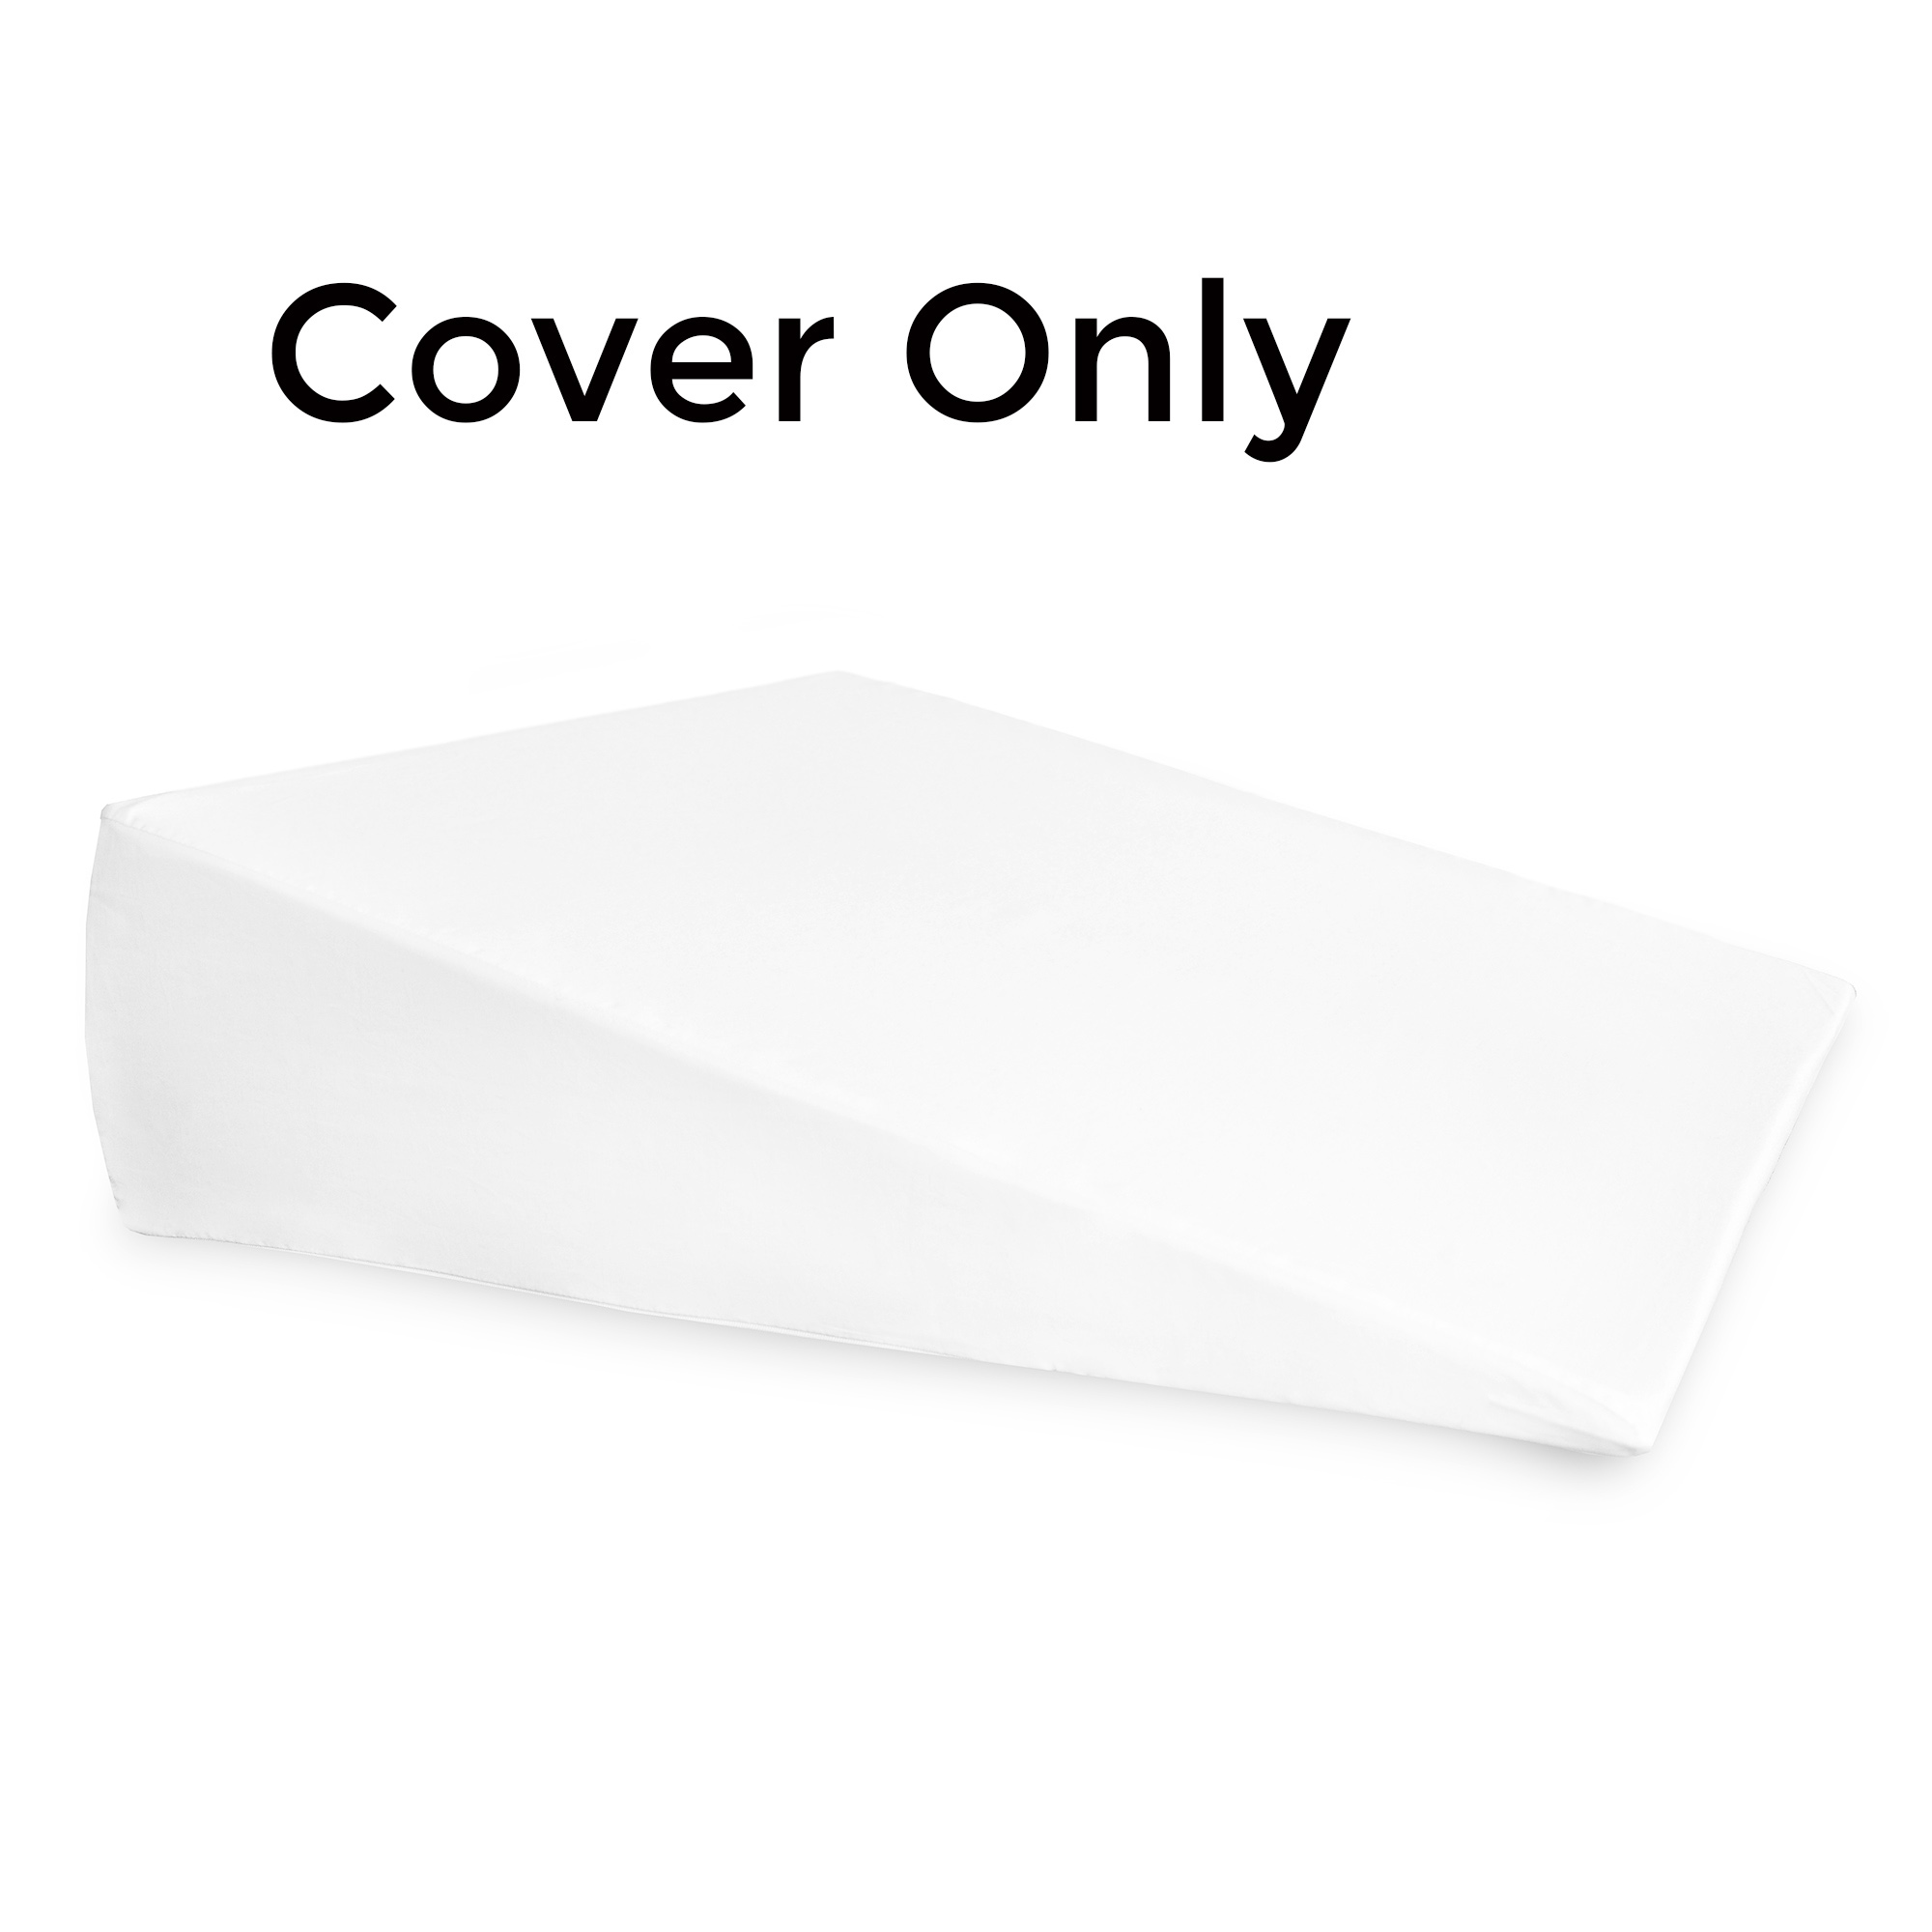 Cotton | Handspun Pillow Case